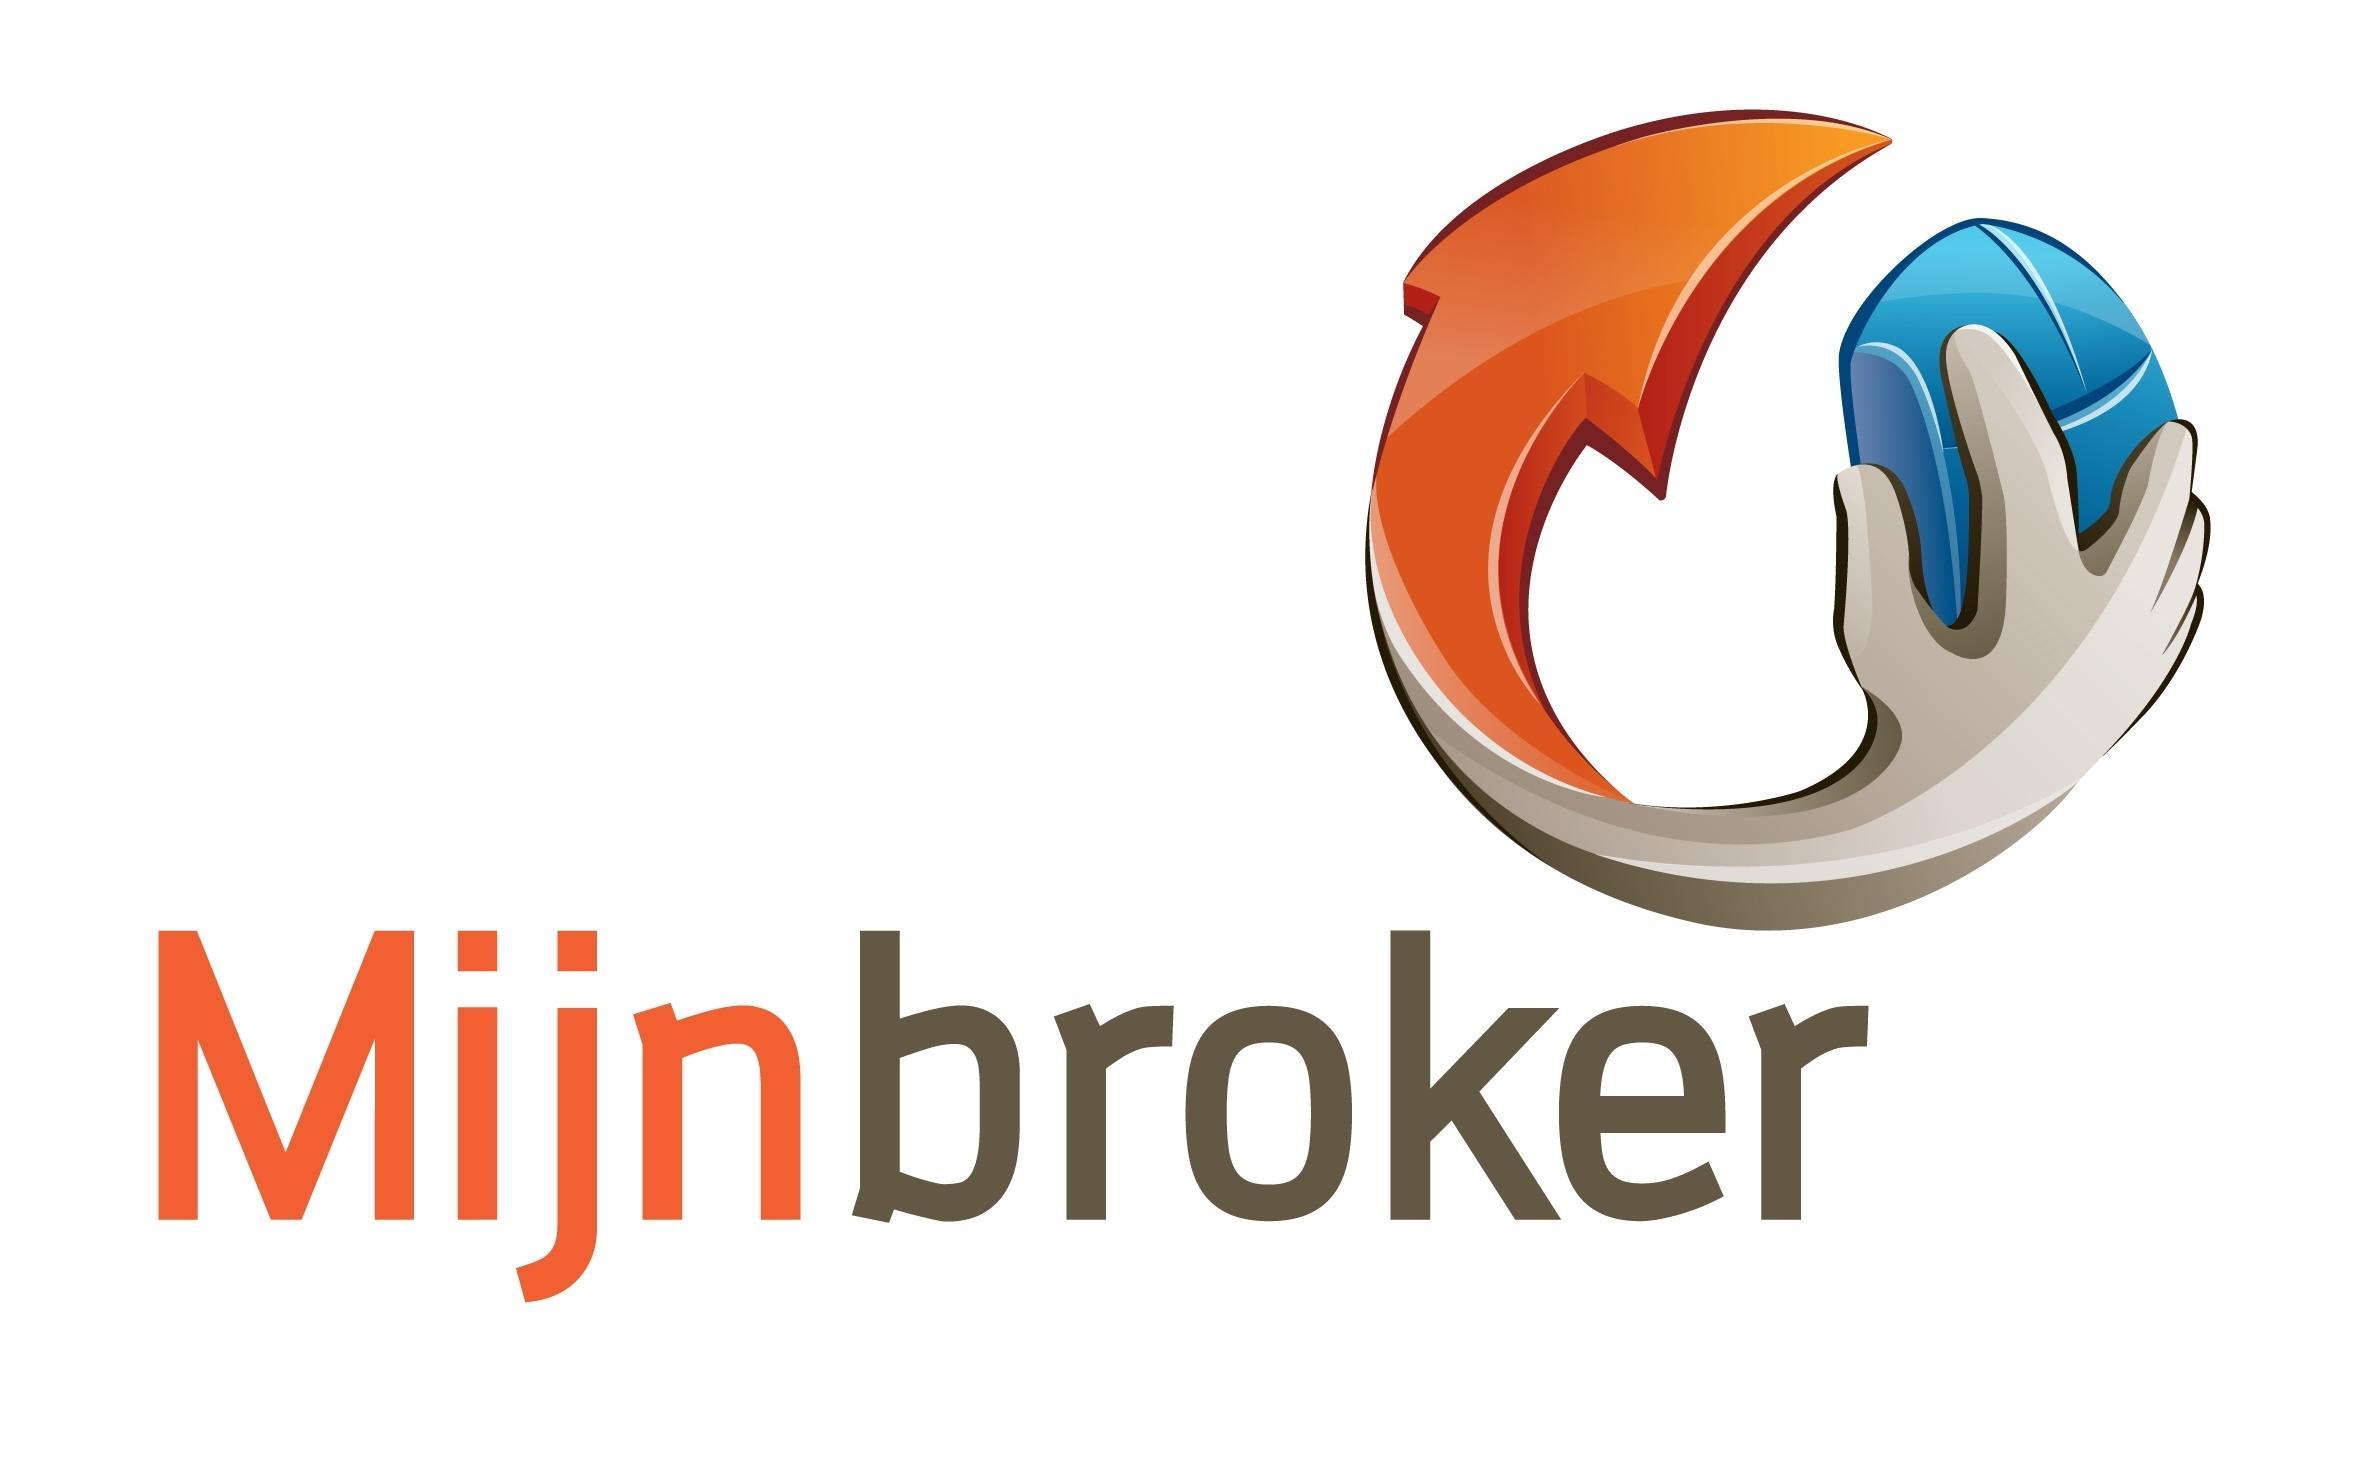 Mijnbroker logo